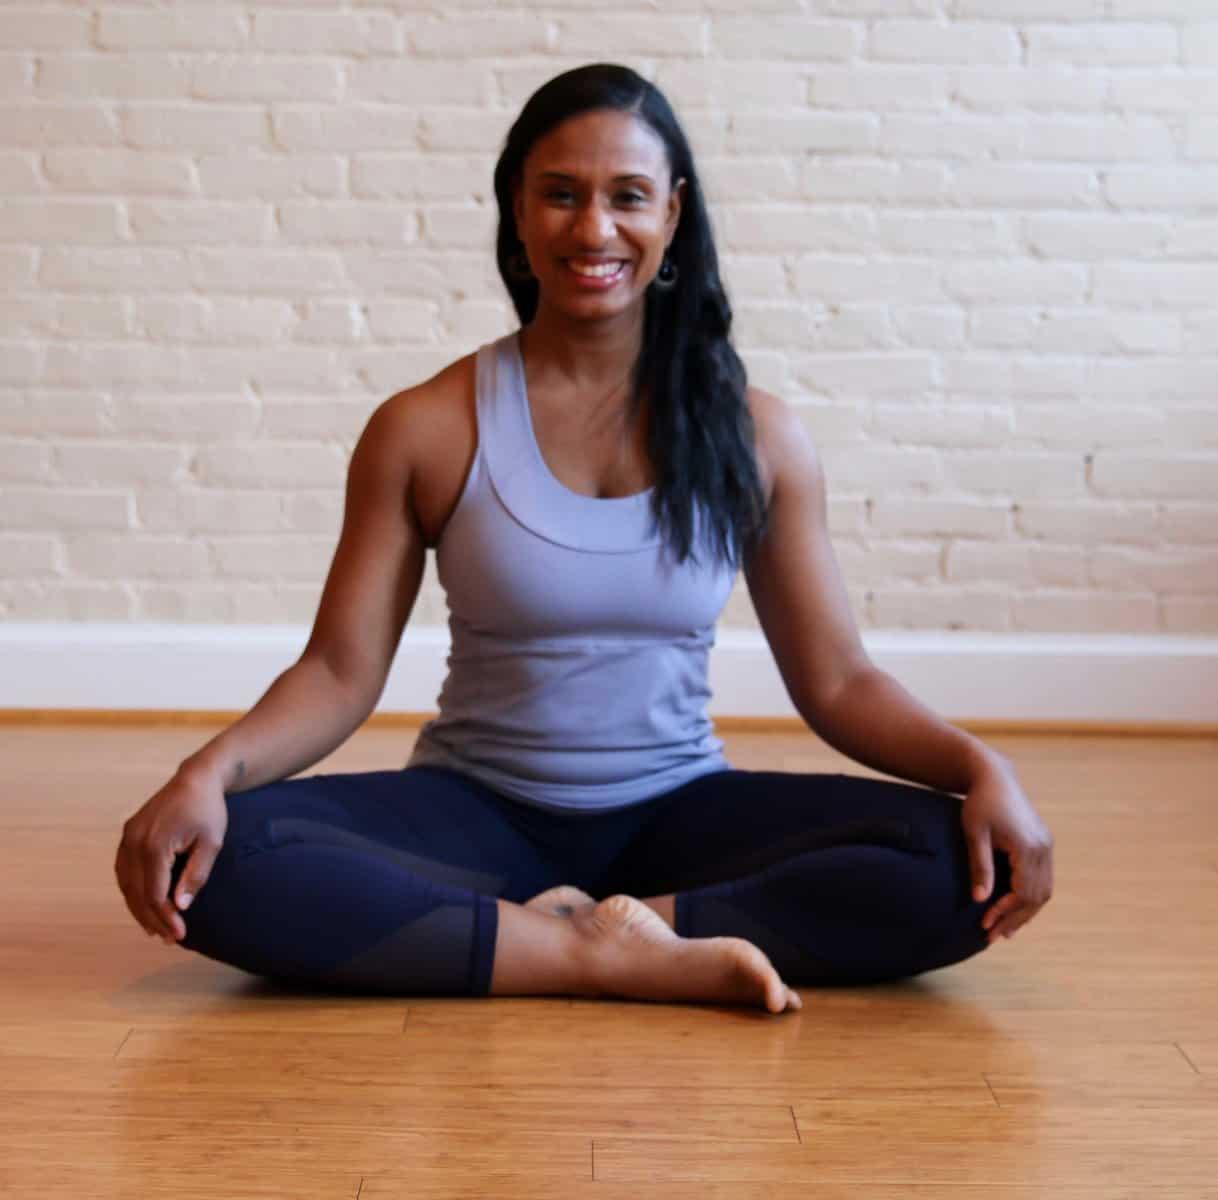 Massage Therapists - Georgetown Massage and Bodywork